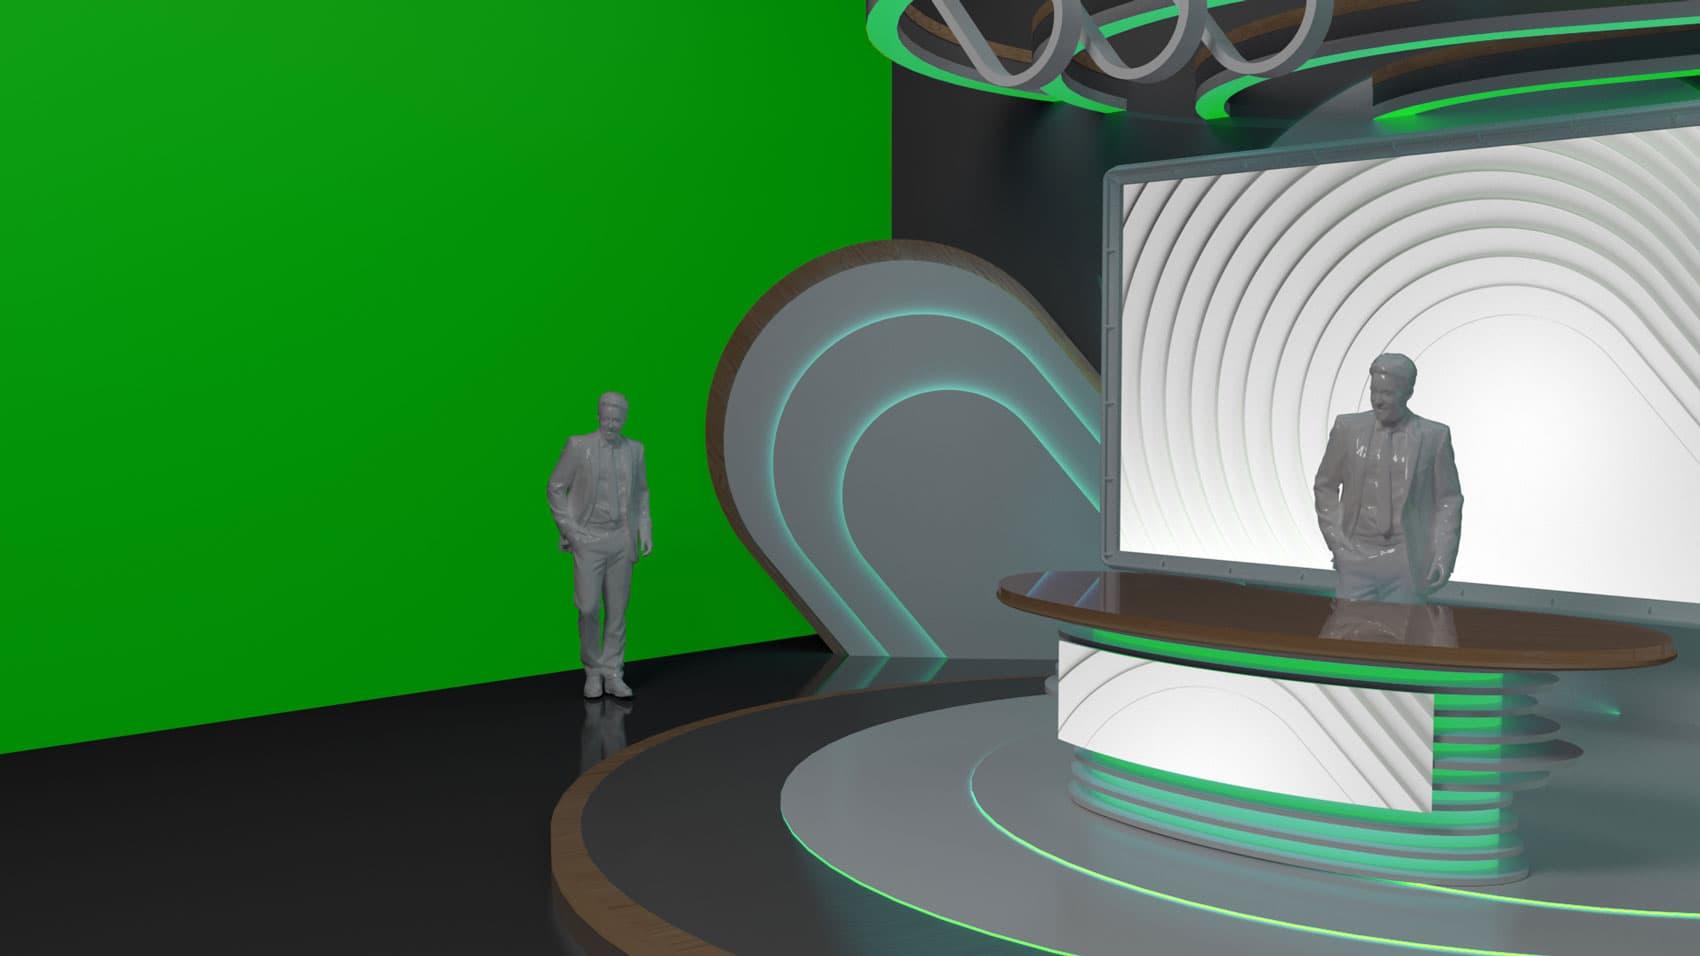 2019 Sky Racing Virtual Set Concept 05 Girraphic